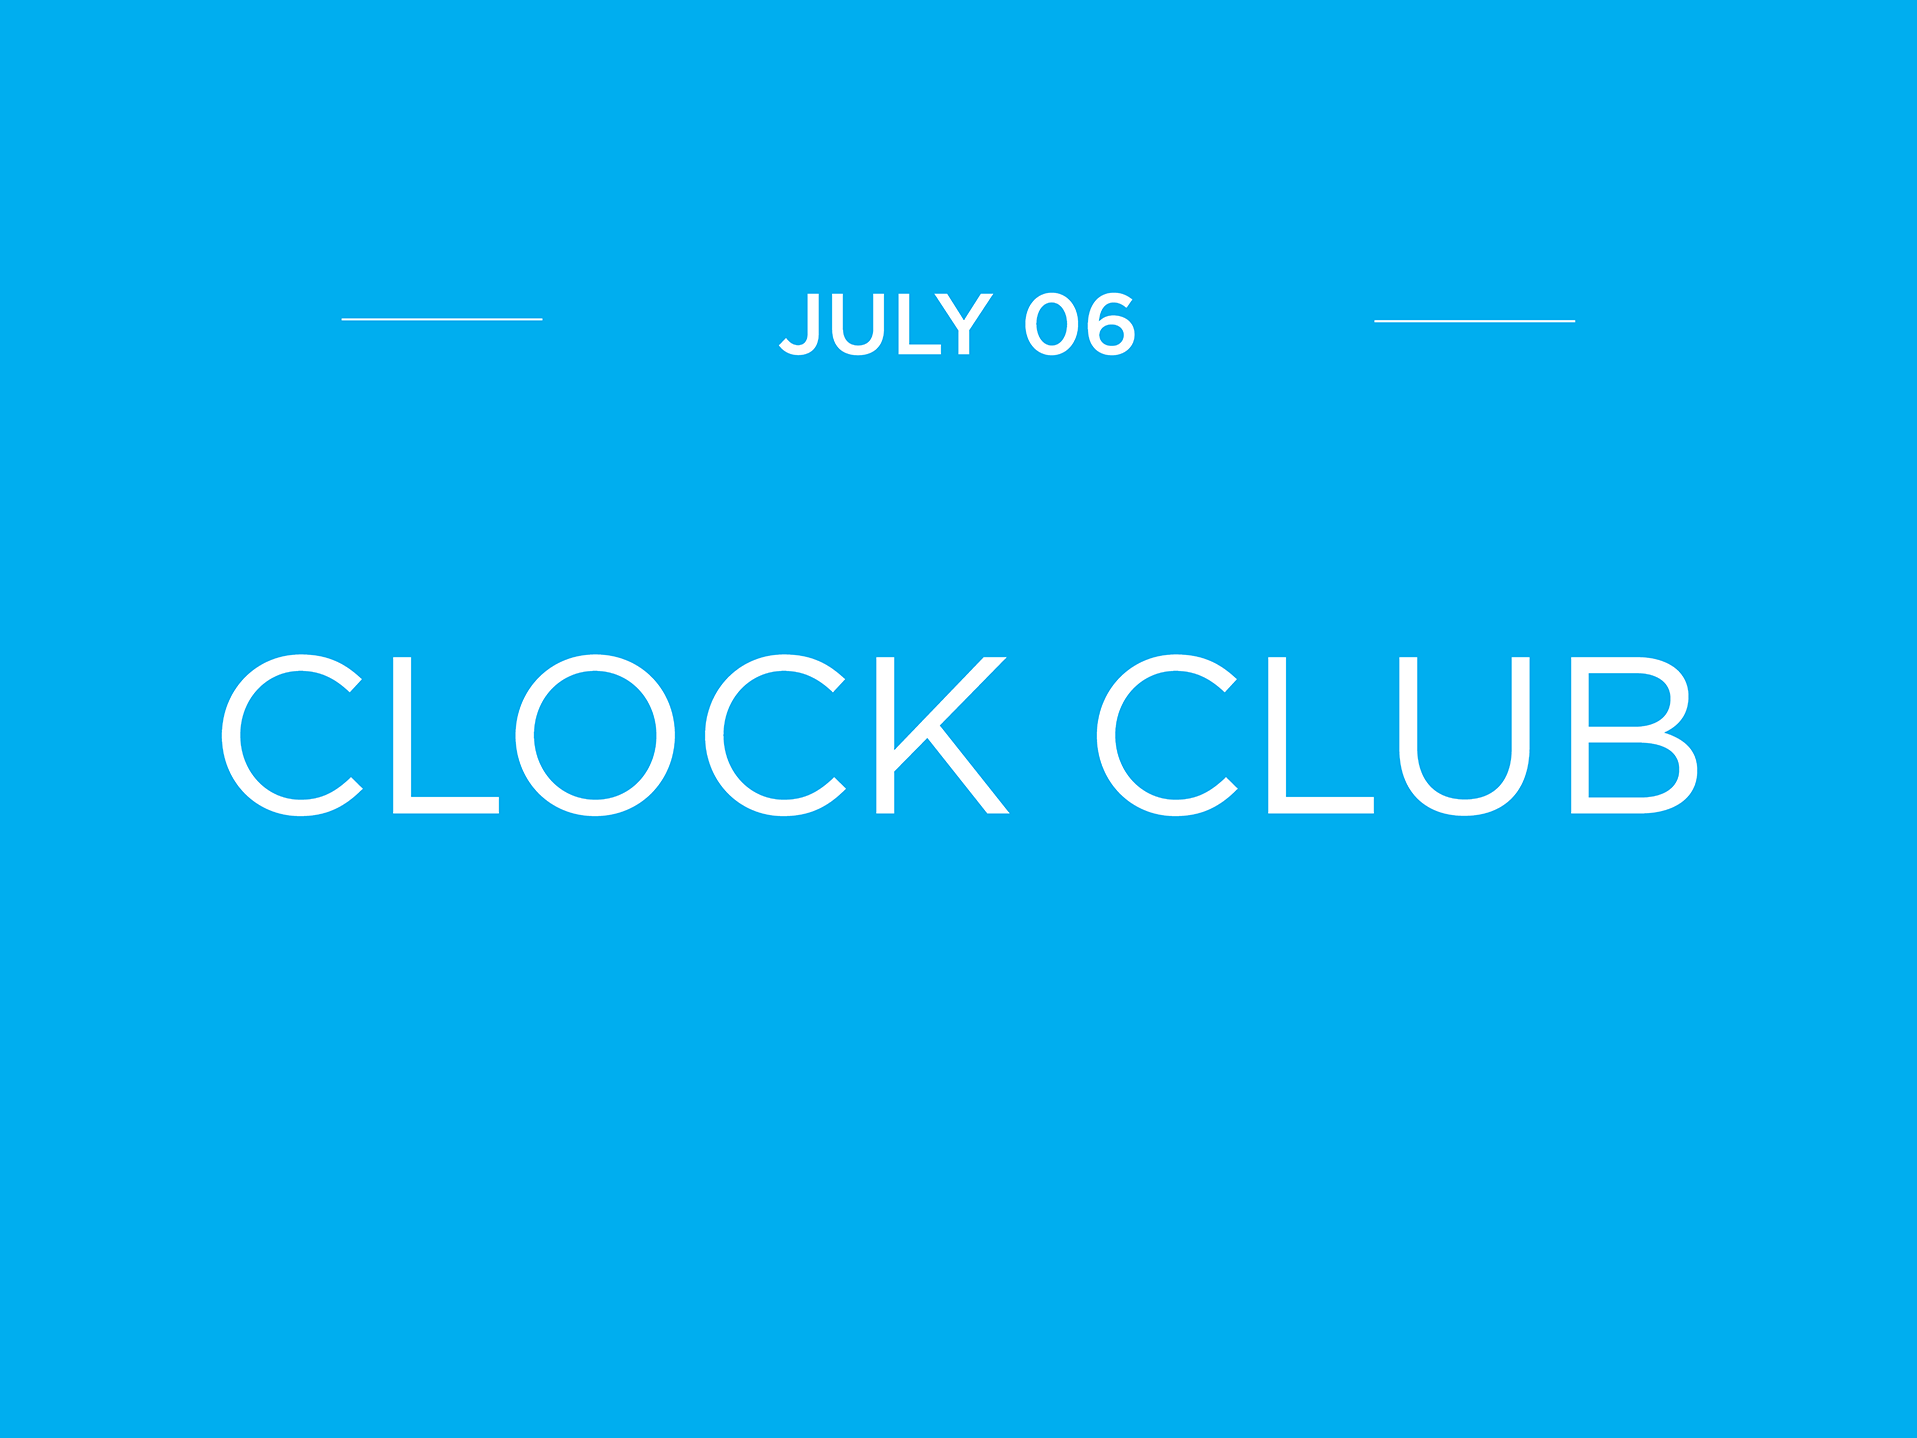 Summer UK Clock Club Meeting ClockClub2018